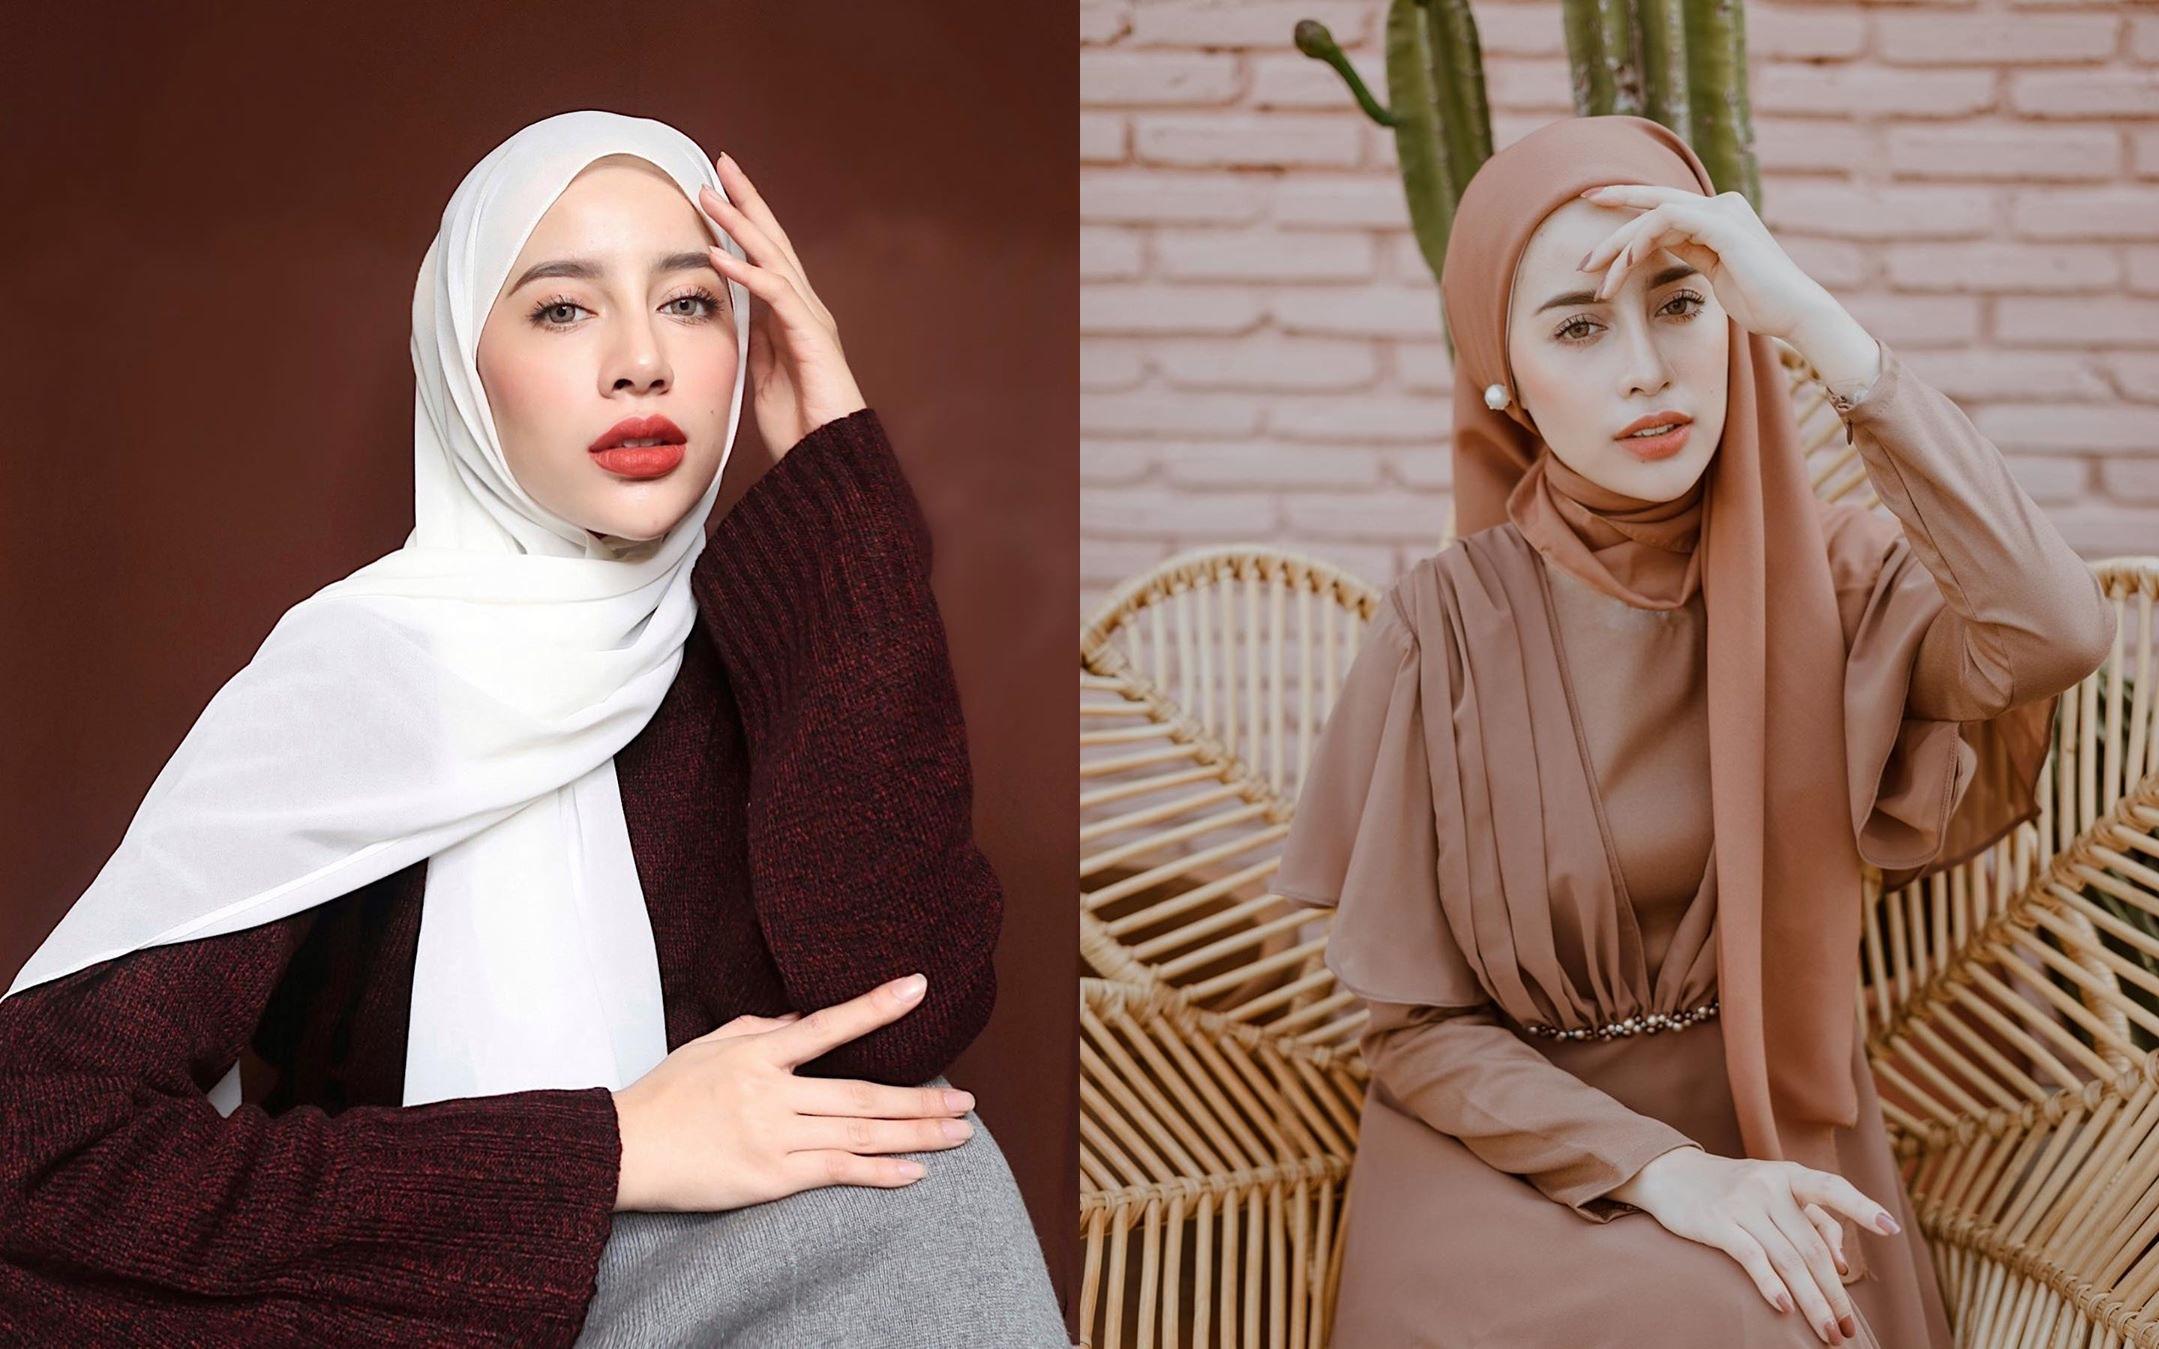 5 Cara memakai jilbab pashmina sesuai bentuk wajah